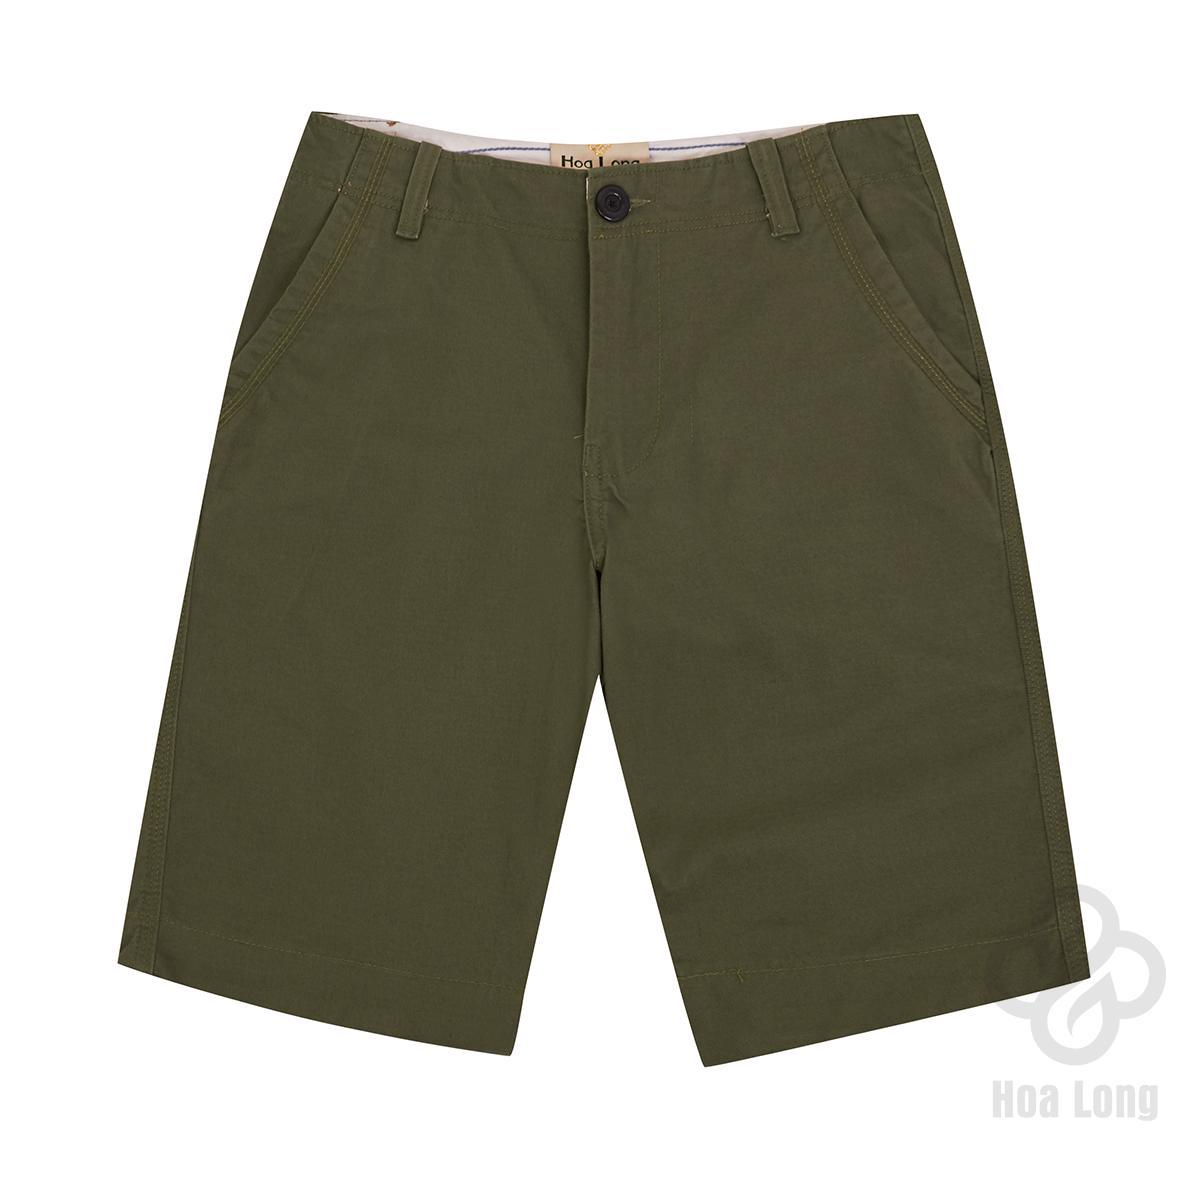 Mua Quần Short Kaki Nam 100 Cotton Cao Cấp Xanh Reu Hoa Long Co Big Size Trực Tuyến Vietnam